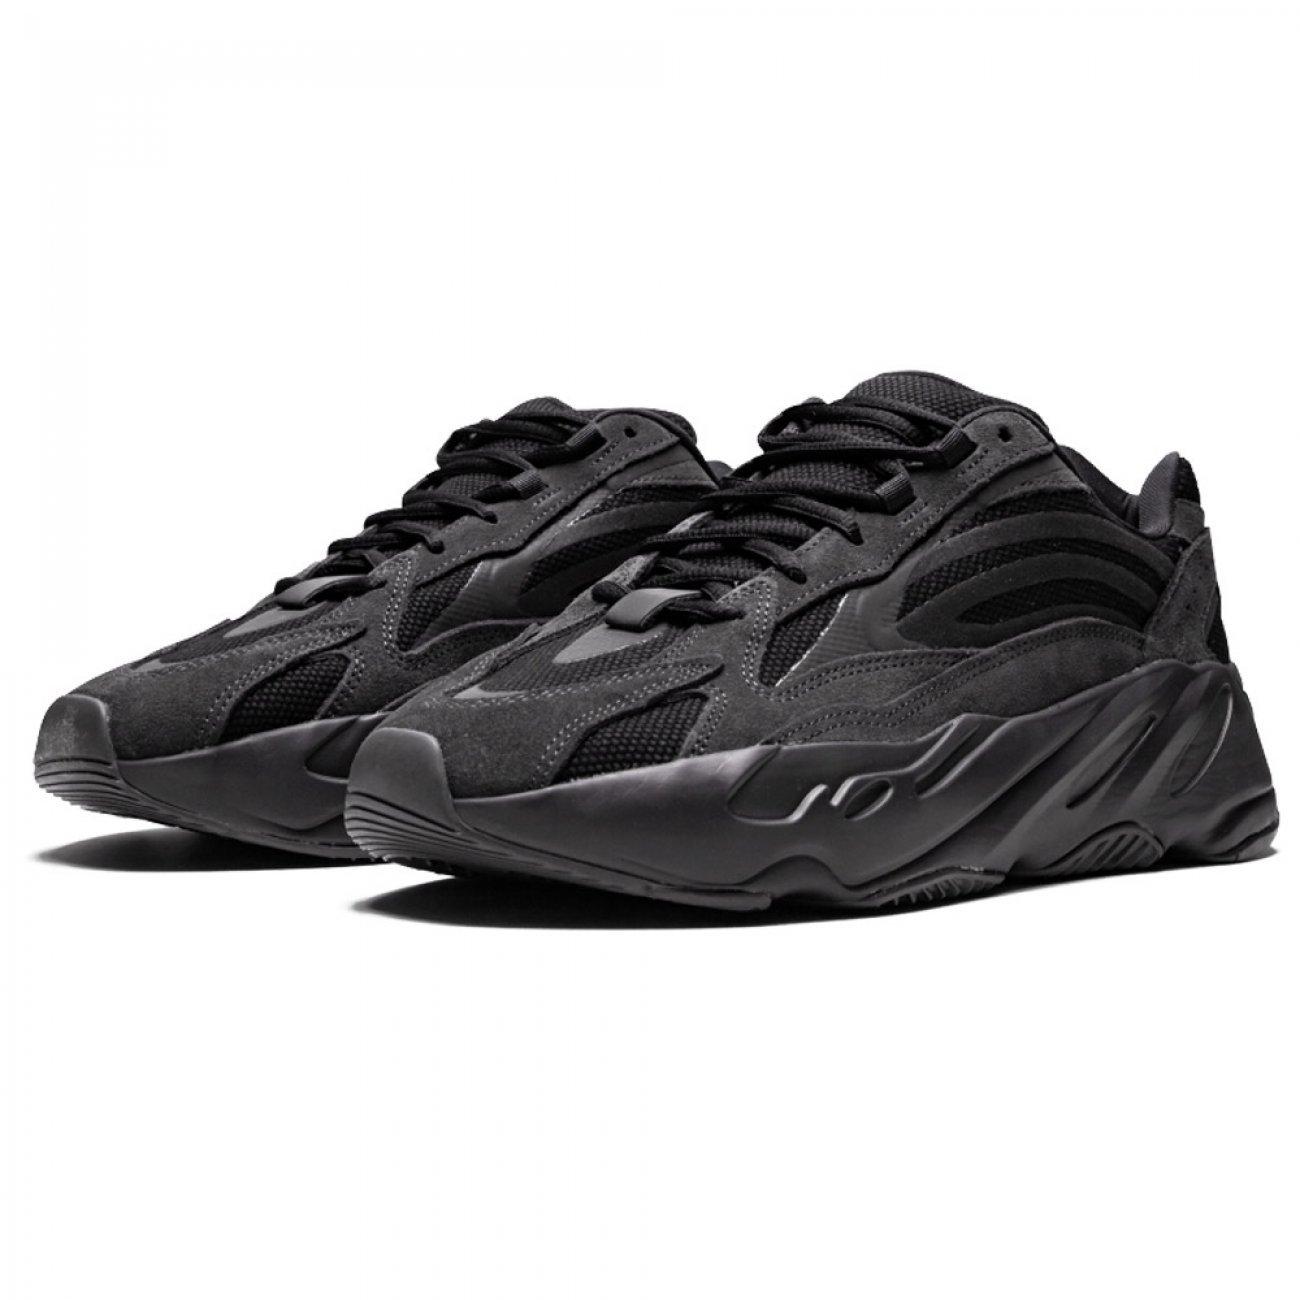 Adidas Yeezy Boost 700 V2 Vanta - FR : 41   1/3        US : 8 image